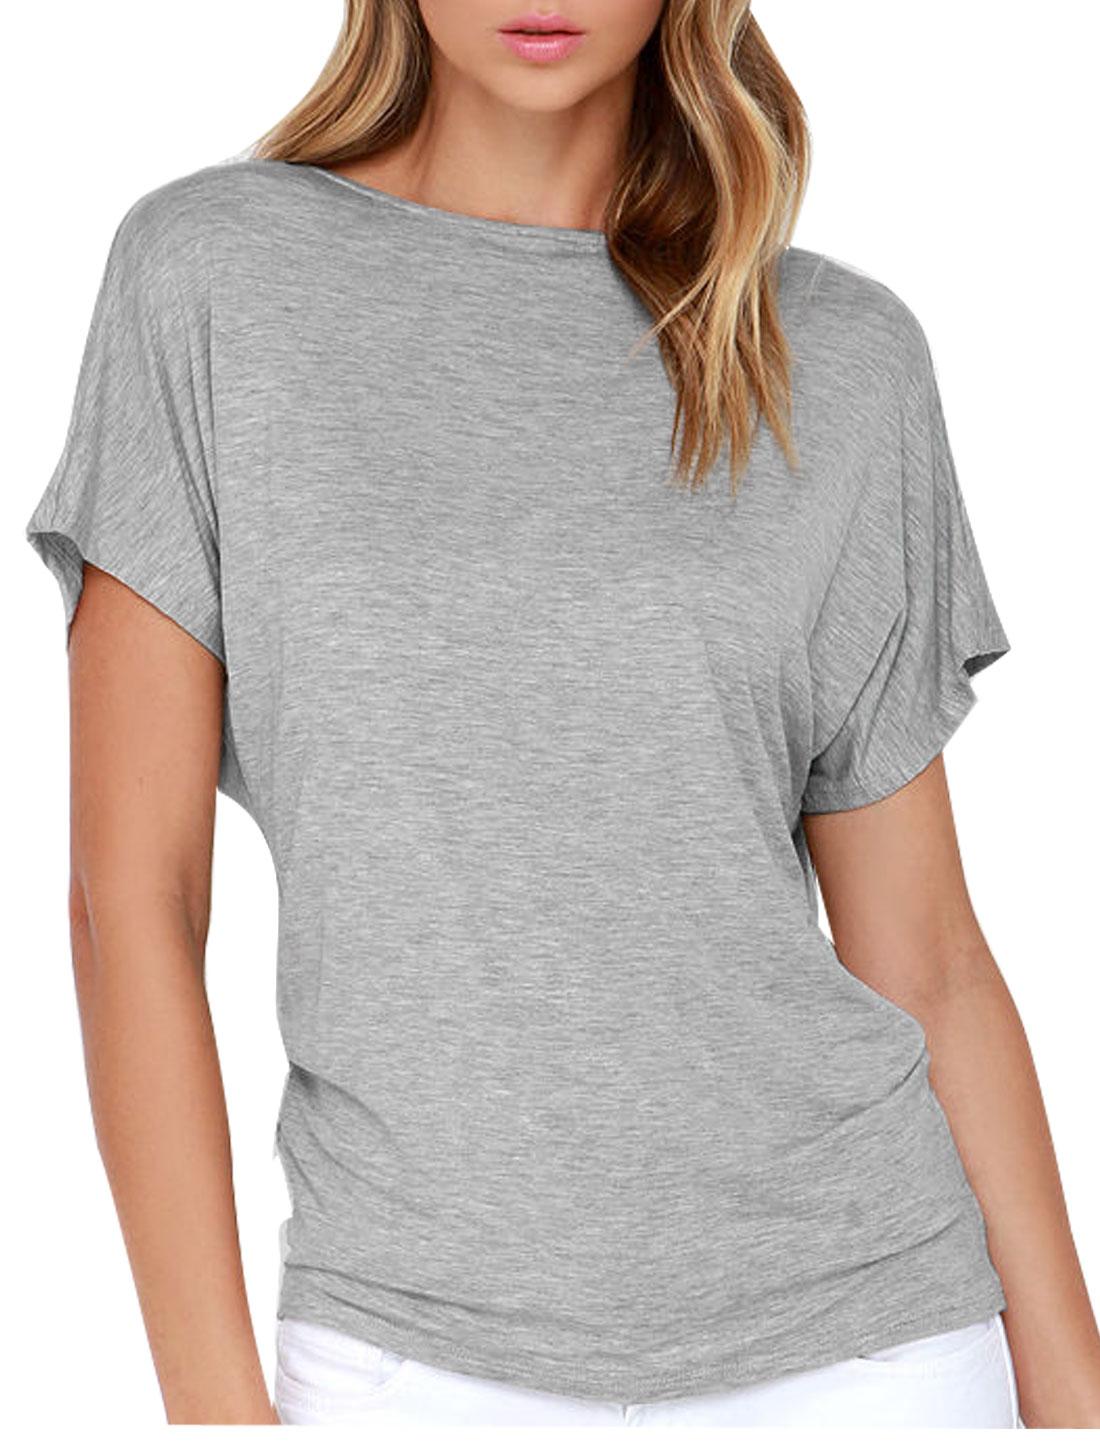 Women Short Raglan Sleeve Summer Casual Tops Light Gray M